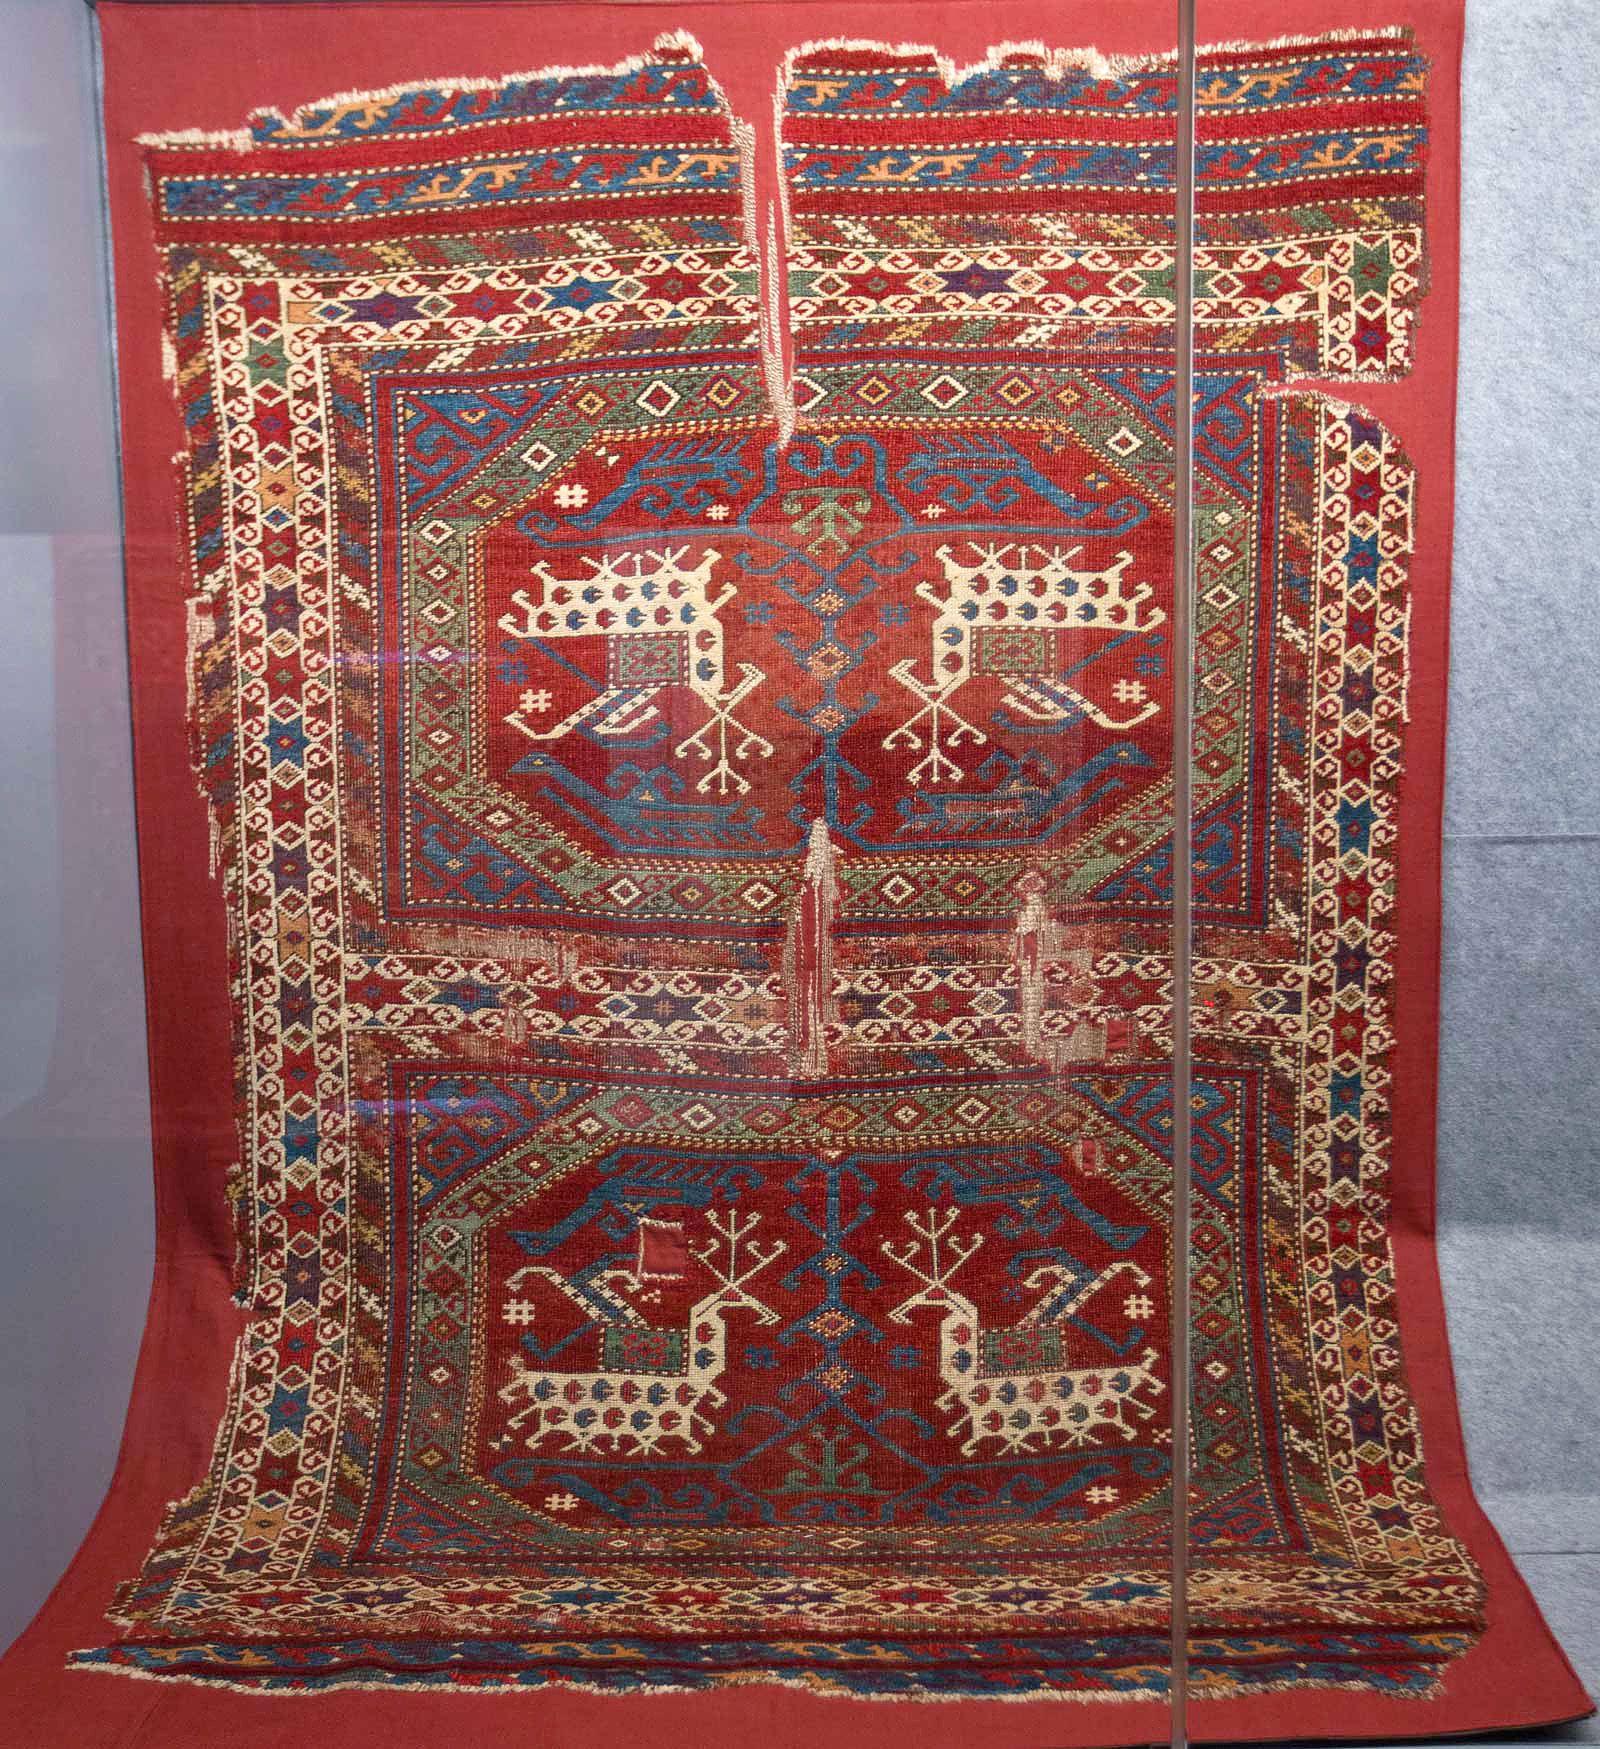 Early Anatolian Turkish Rug With Animal Motif, 15th